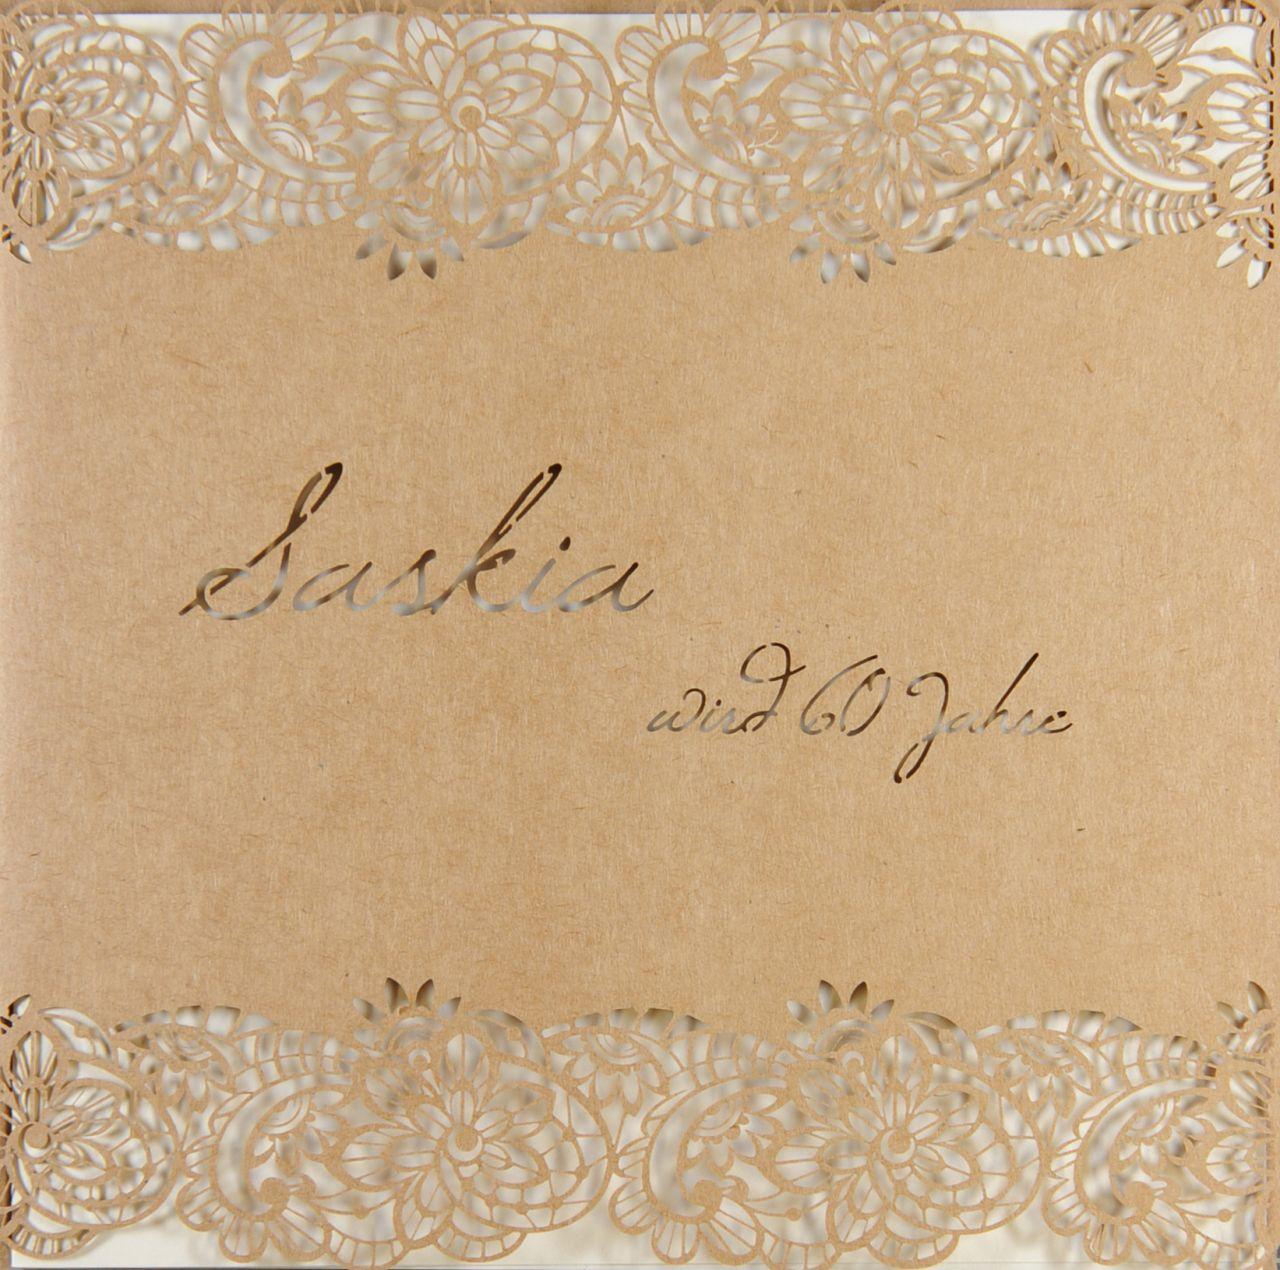 Einladungskarte - A 2128